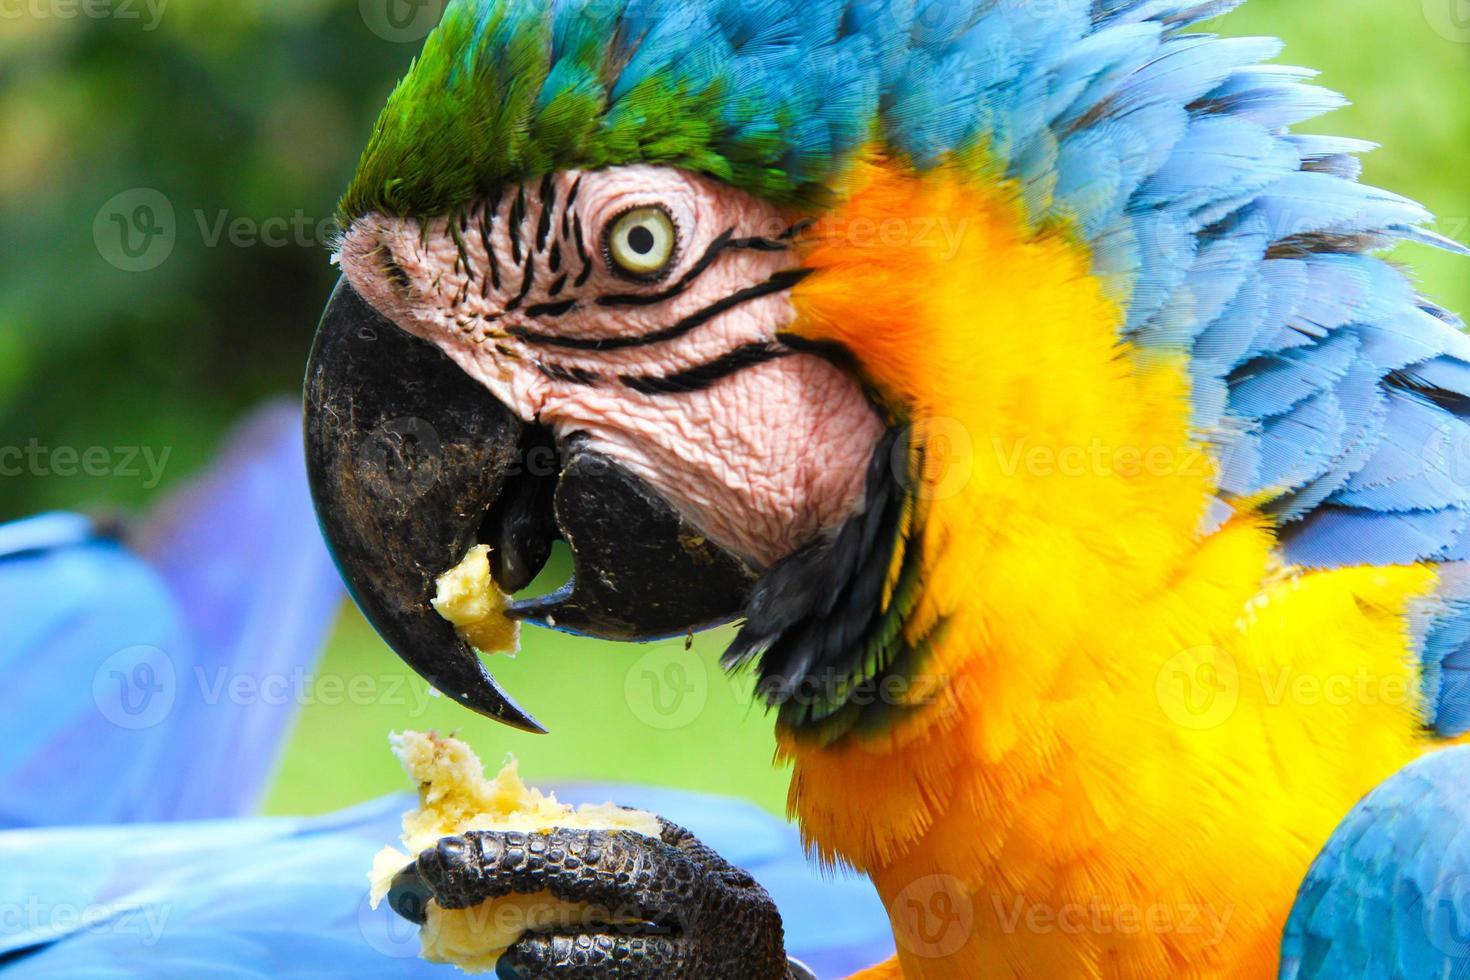 arara comendo banana foto